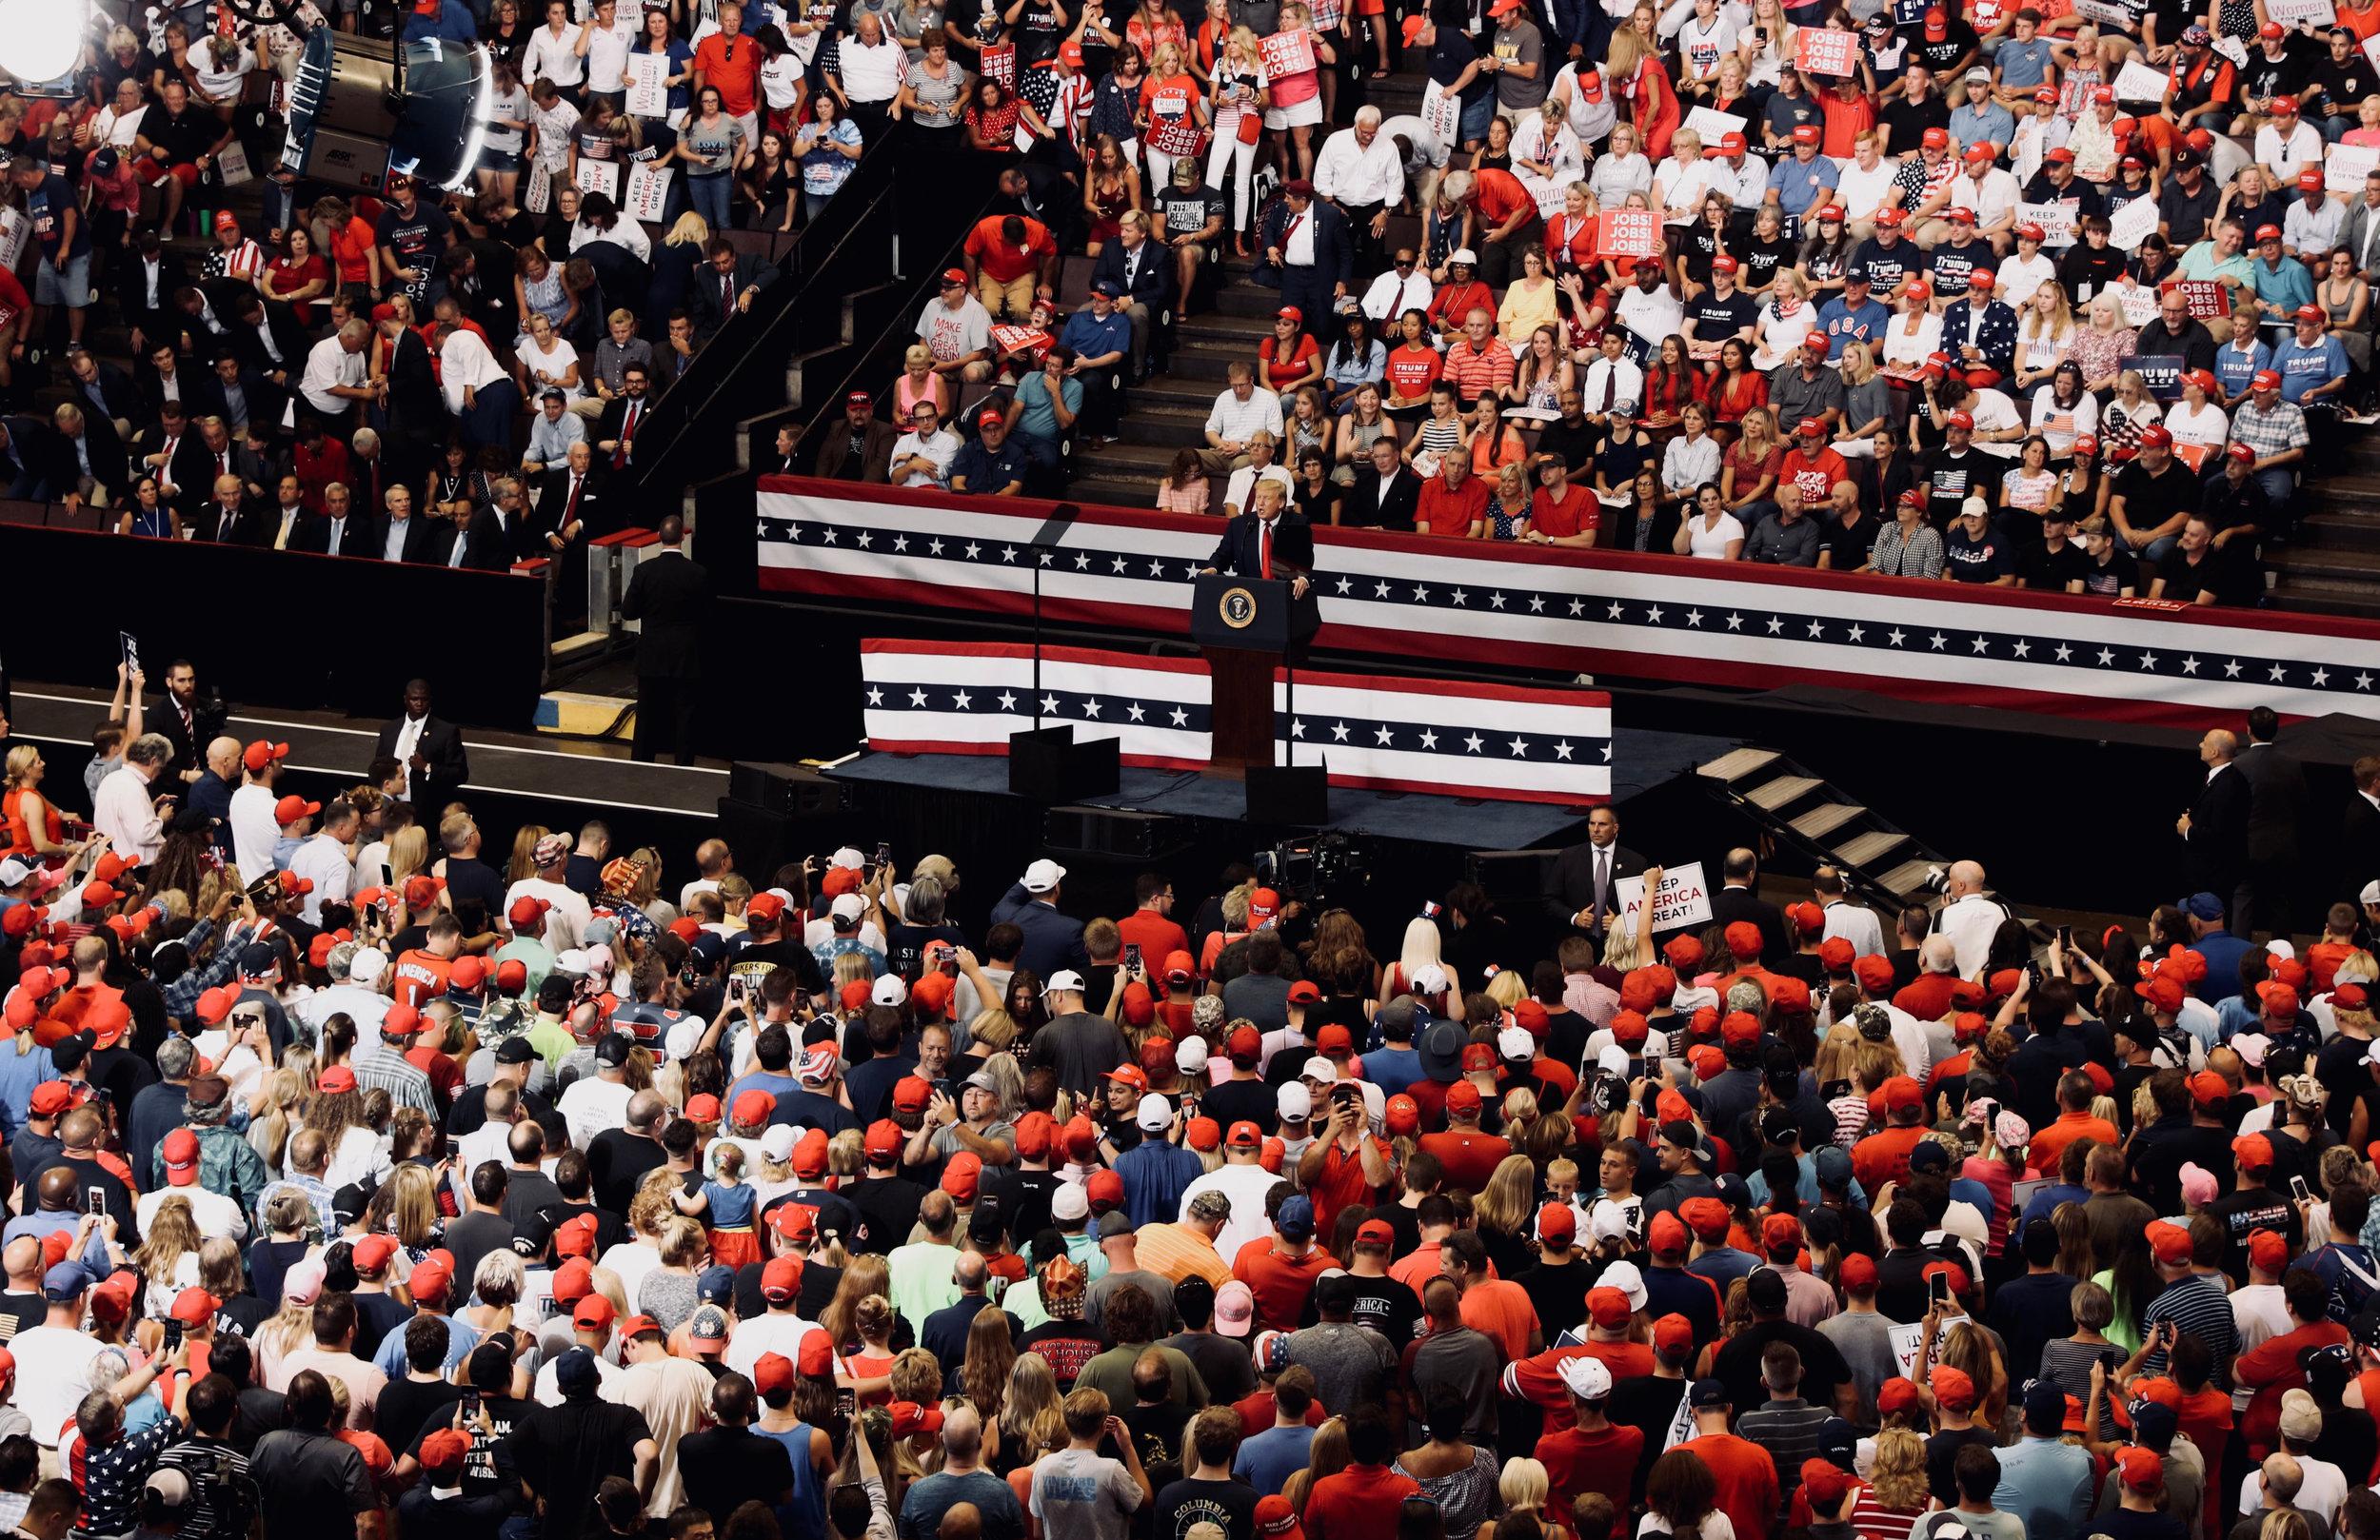 Andy Grant - Trump Rally 8.1.1996.jpg